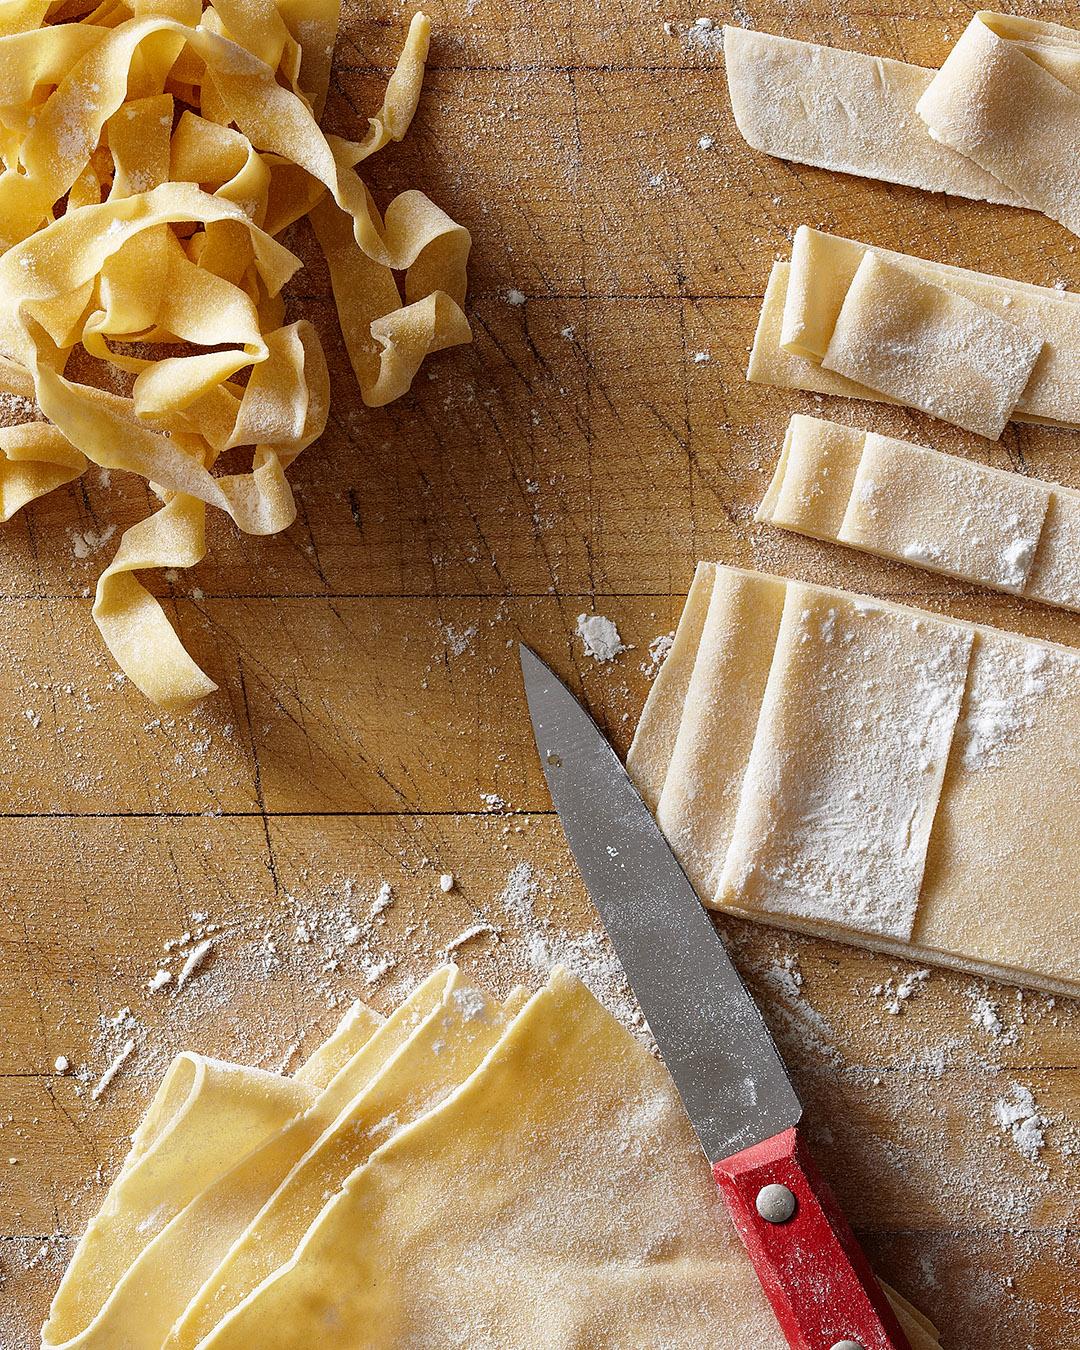 pappardelle wide noodle pasta